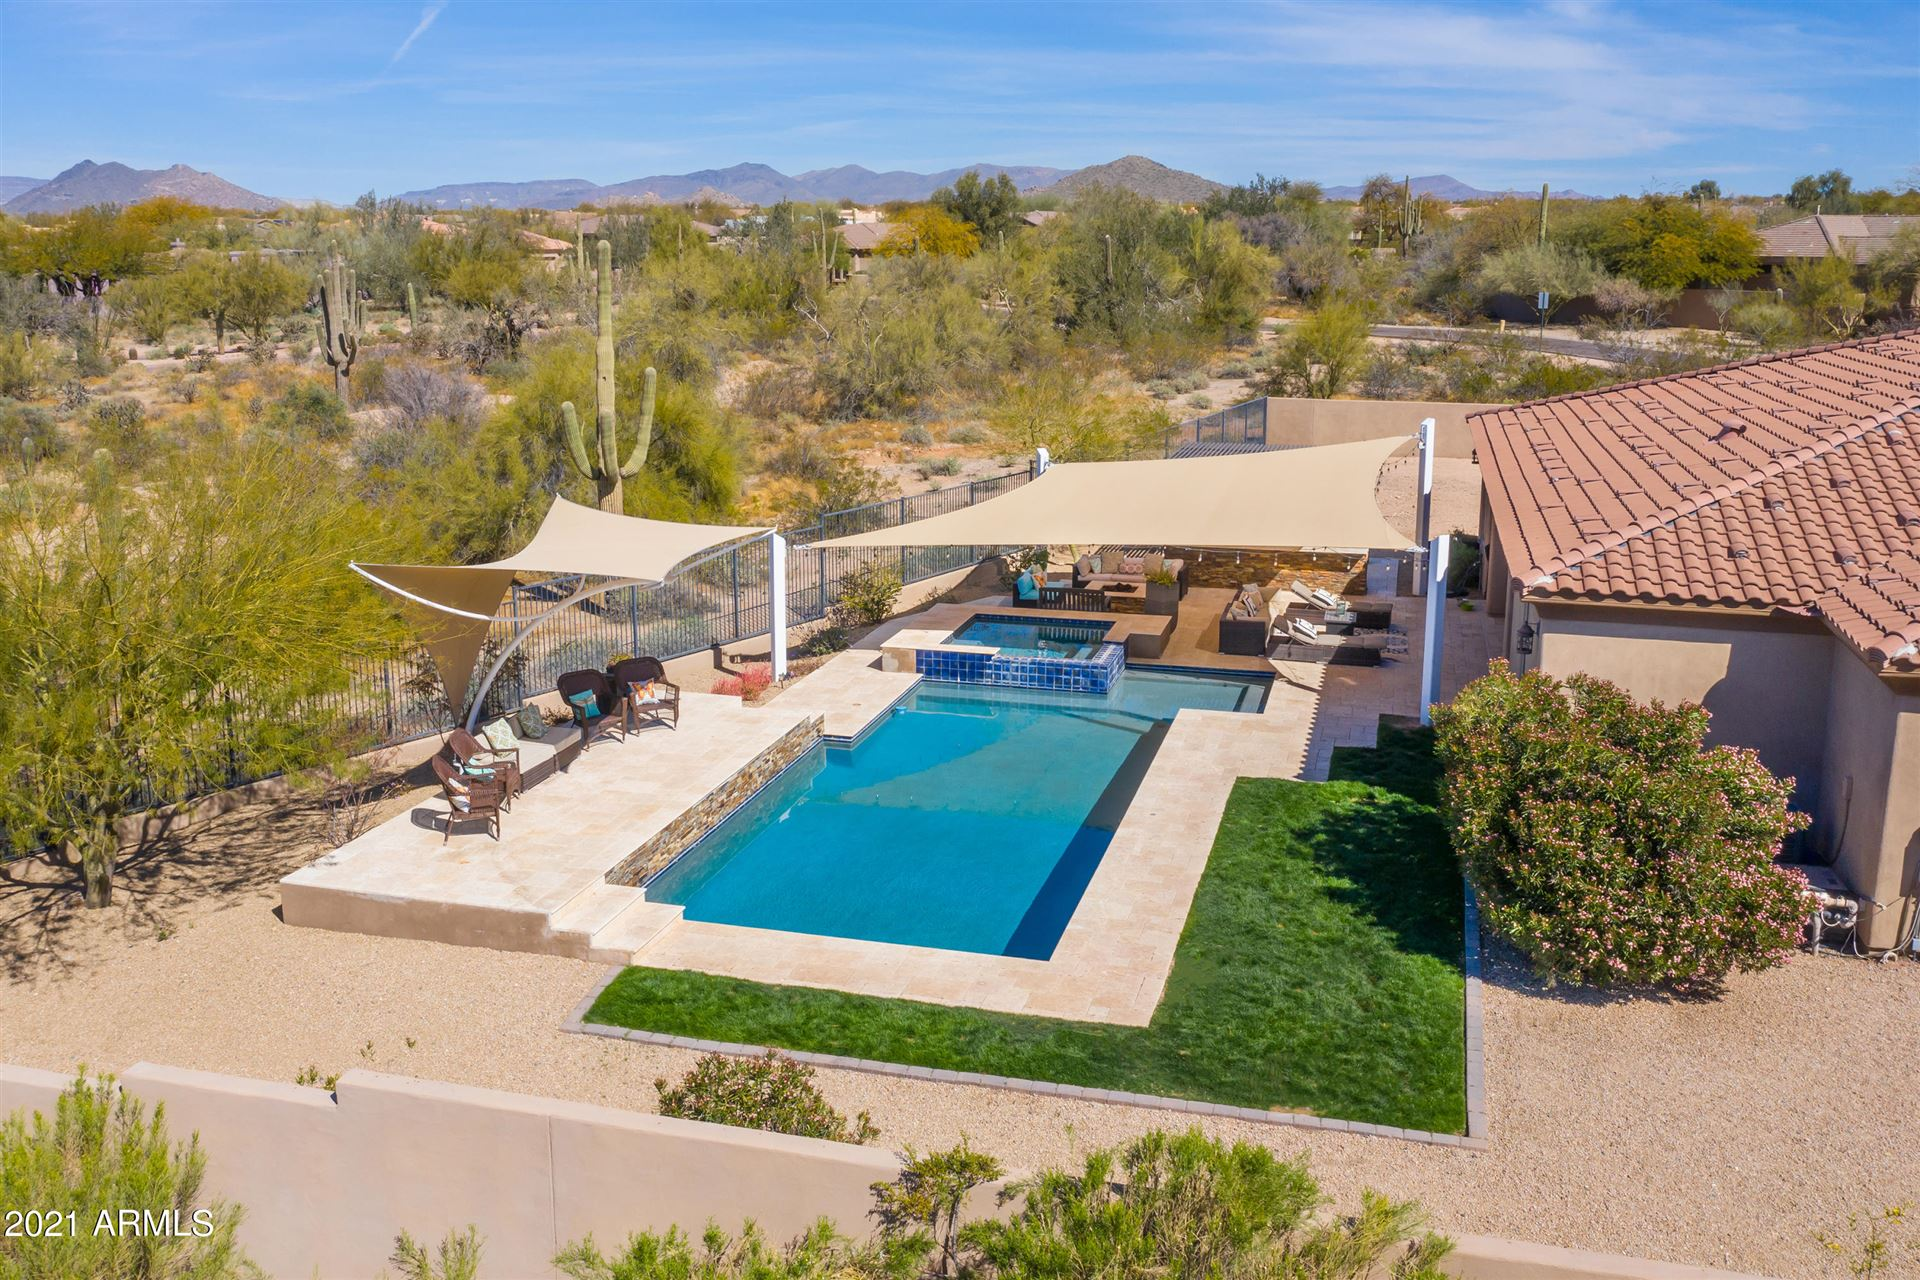 Photo of 26942 N 73RD Street, Scottsdale, AZ 85266 (MLS # 6200177)